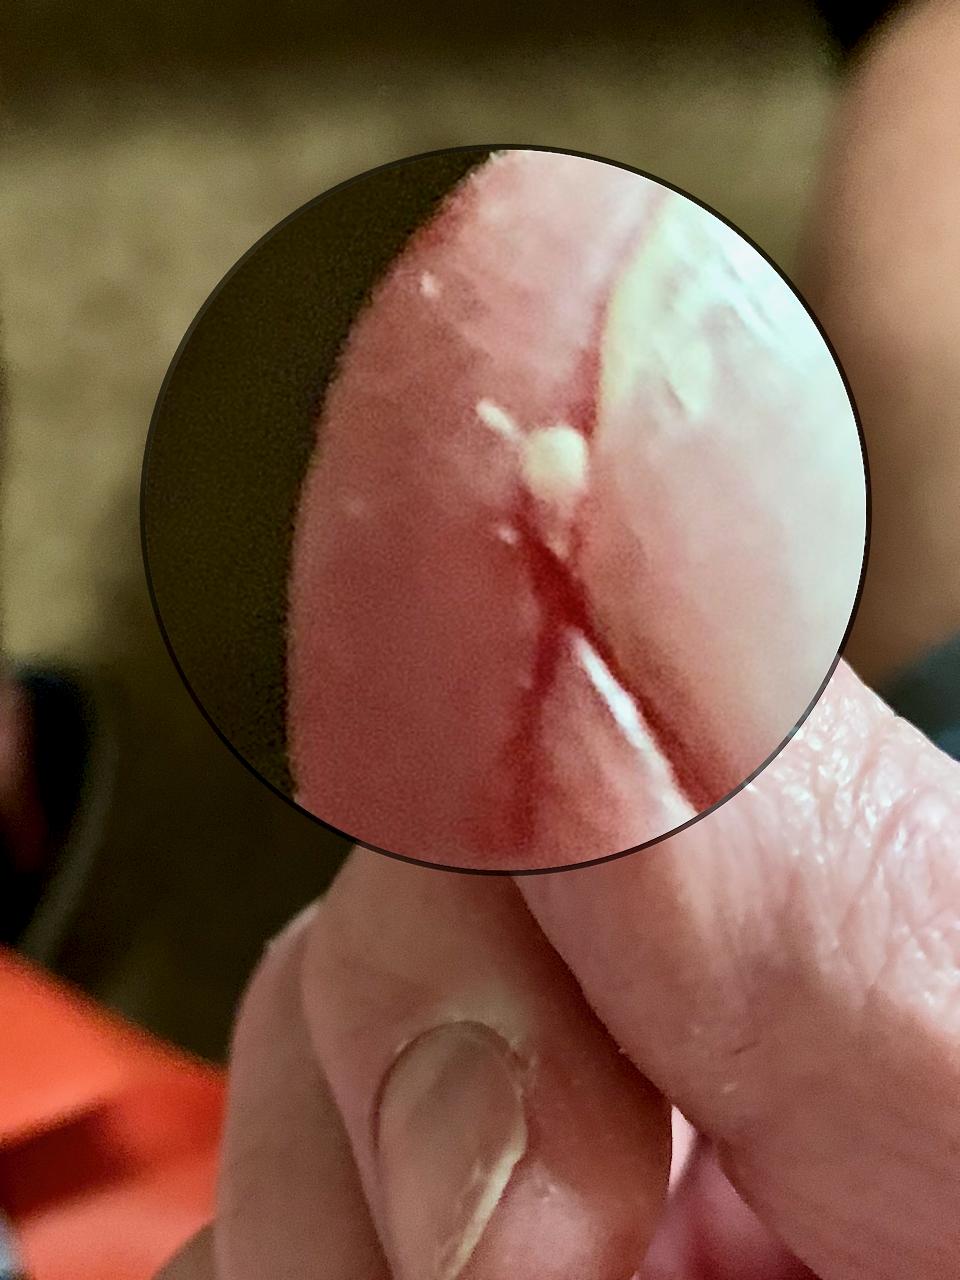 https://www.curezone.org/upload/_U_V_W_Forums/Unidentified_Skin/Parasite_Larva_Thumb_nail.png